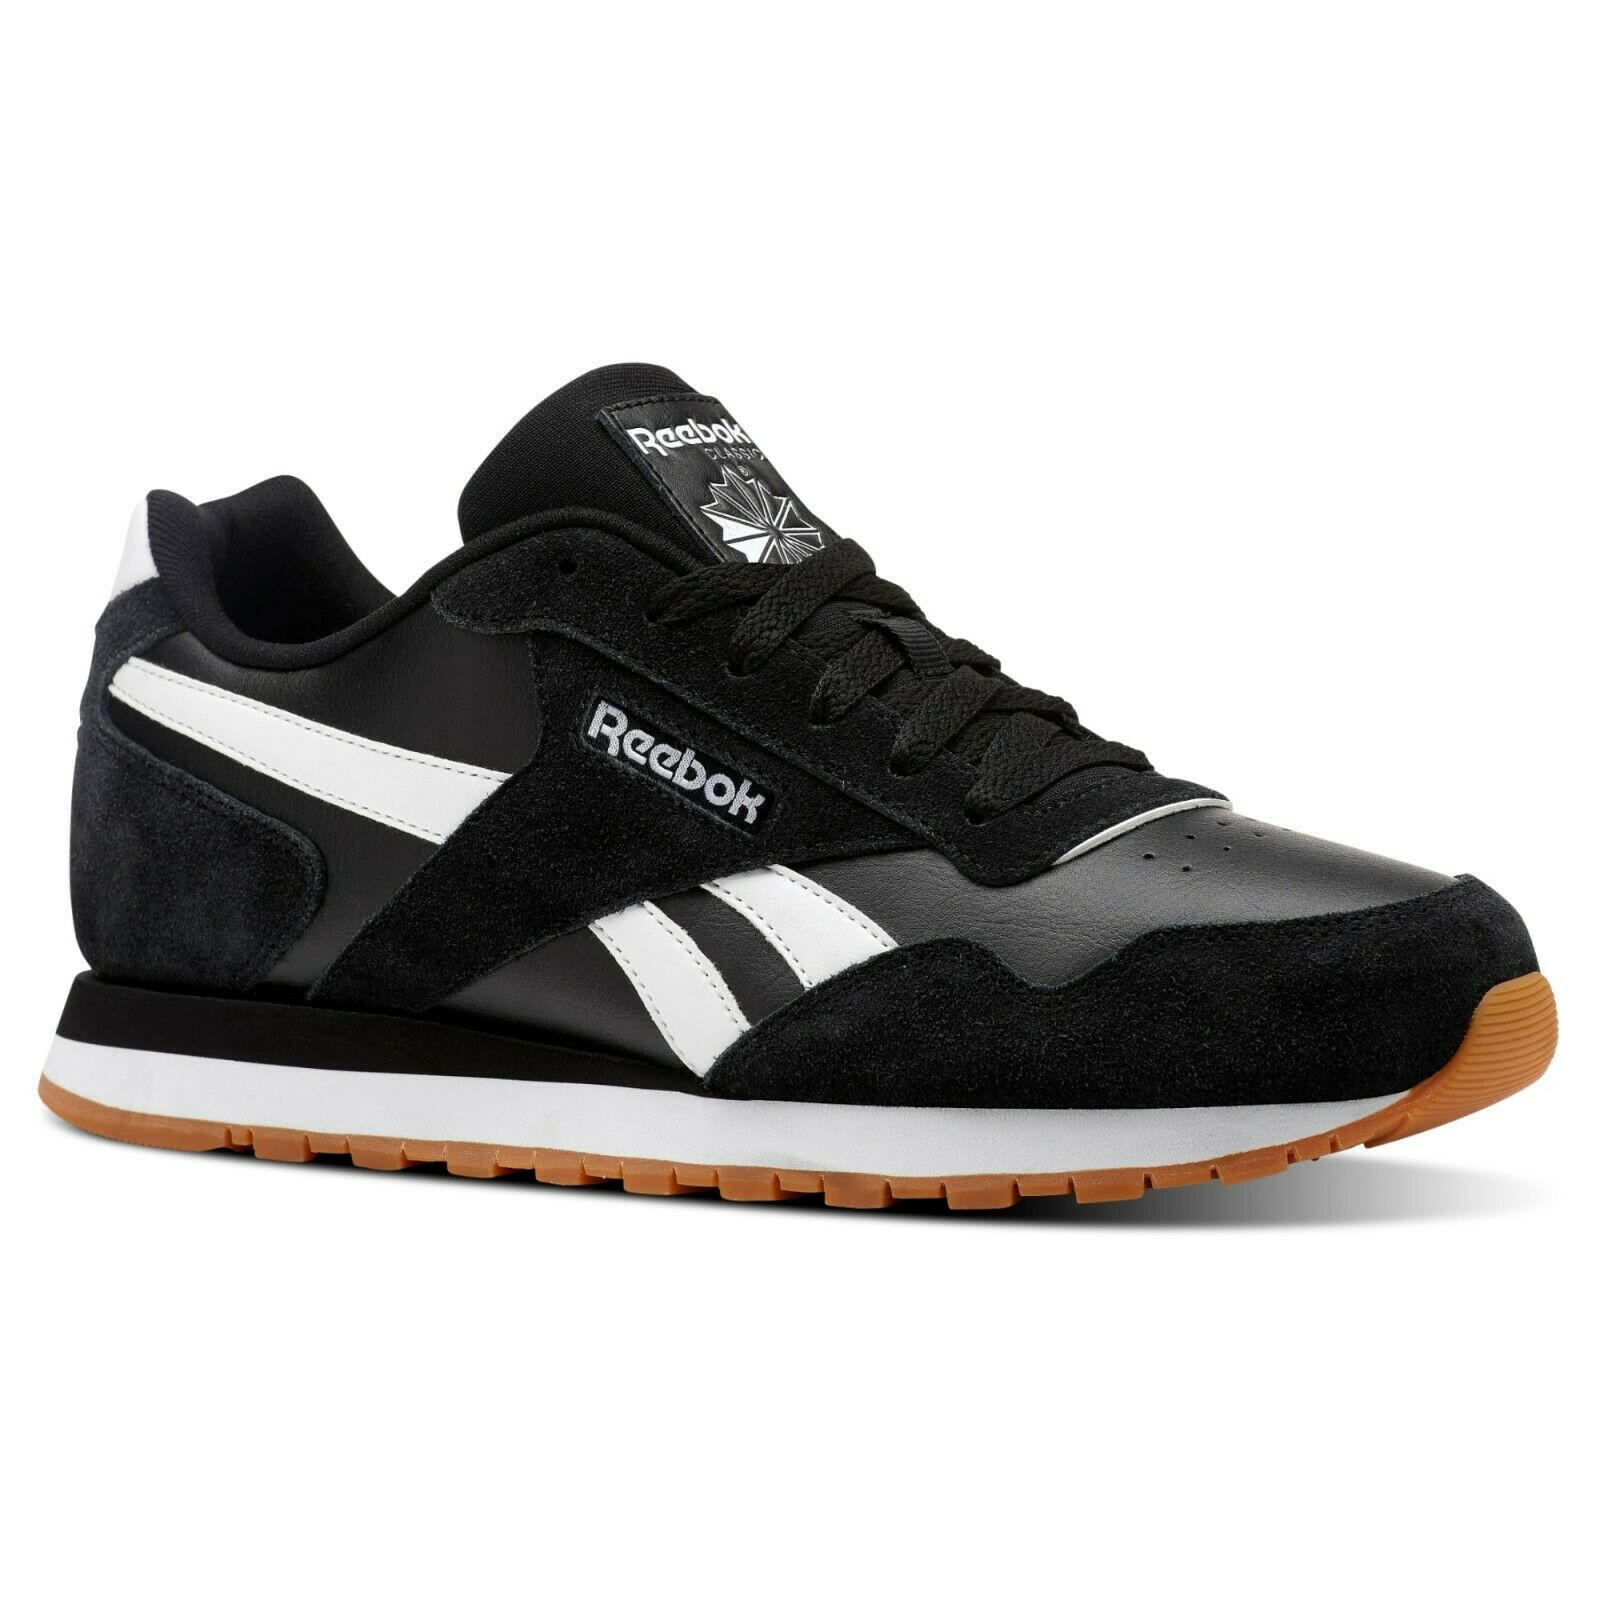 Reebok NPC II White Leather Shoes